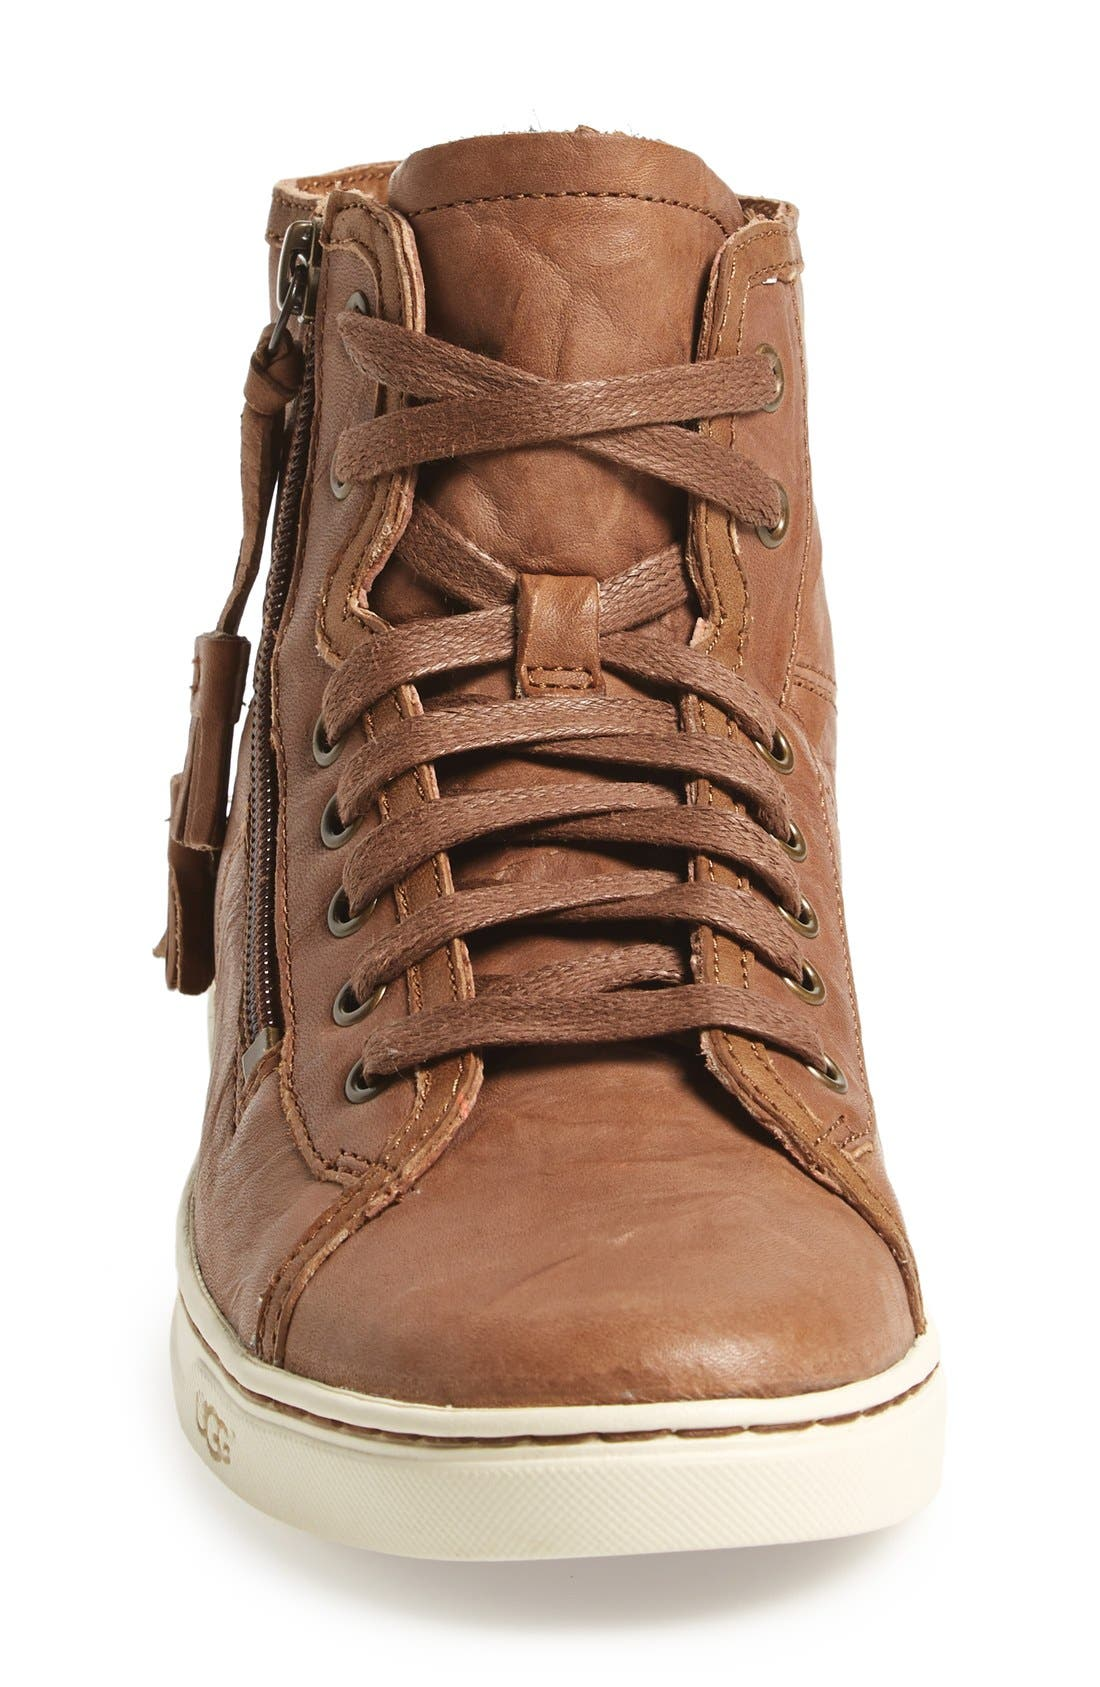 Alternate Image 3  - UGG® 'Blaney' Tasseled High Top Sneaker (Women)